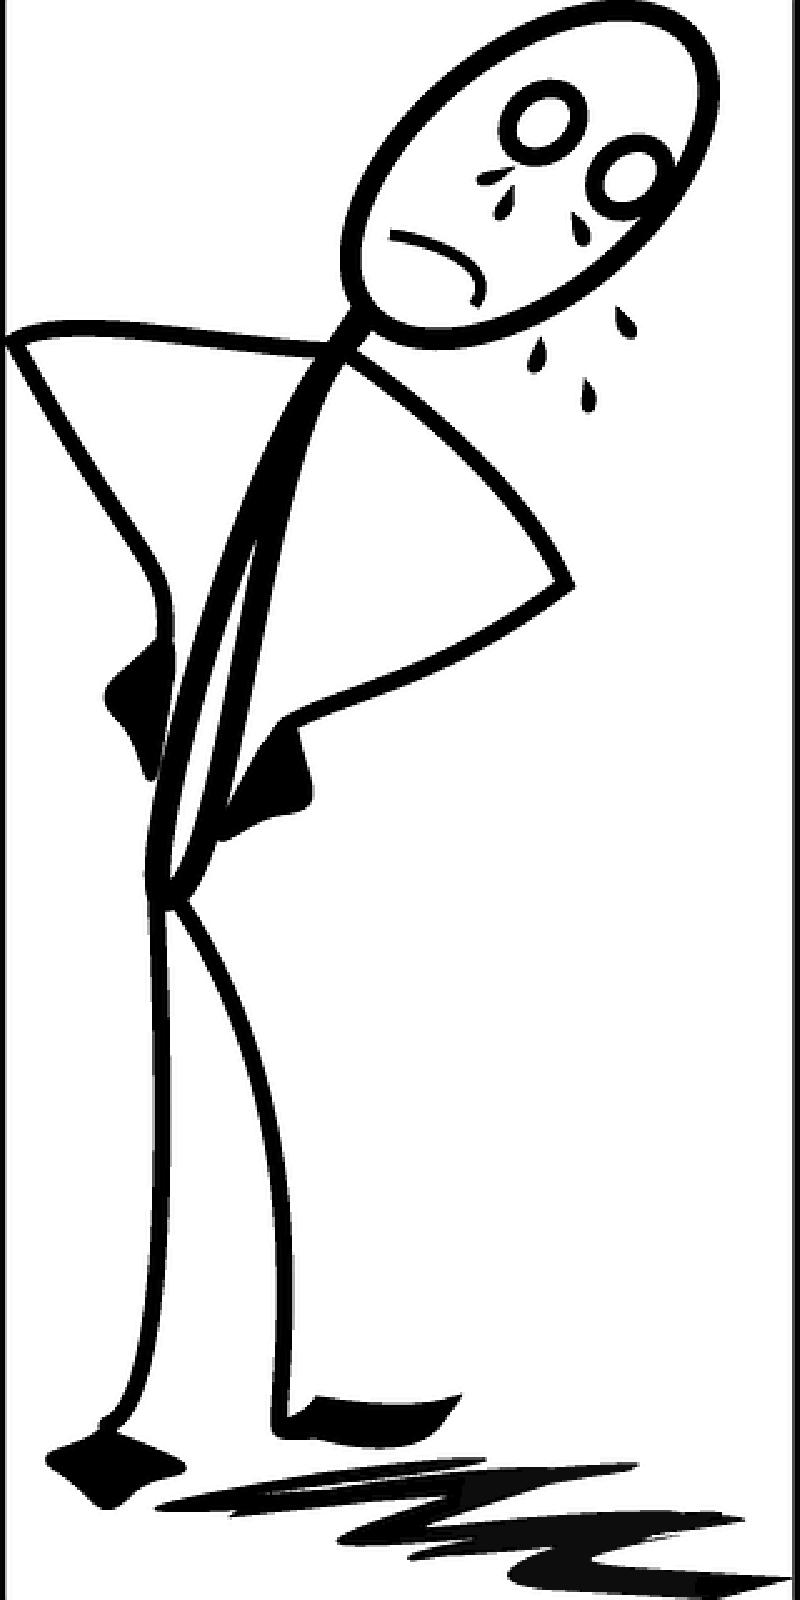 800x1600 Depression Clipart Stick Figure